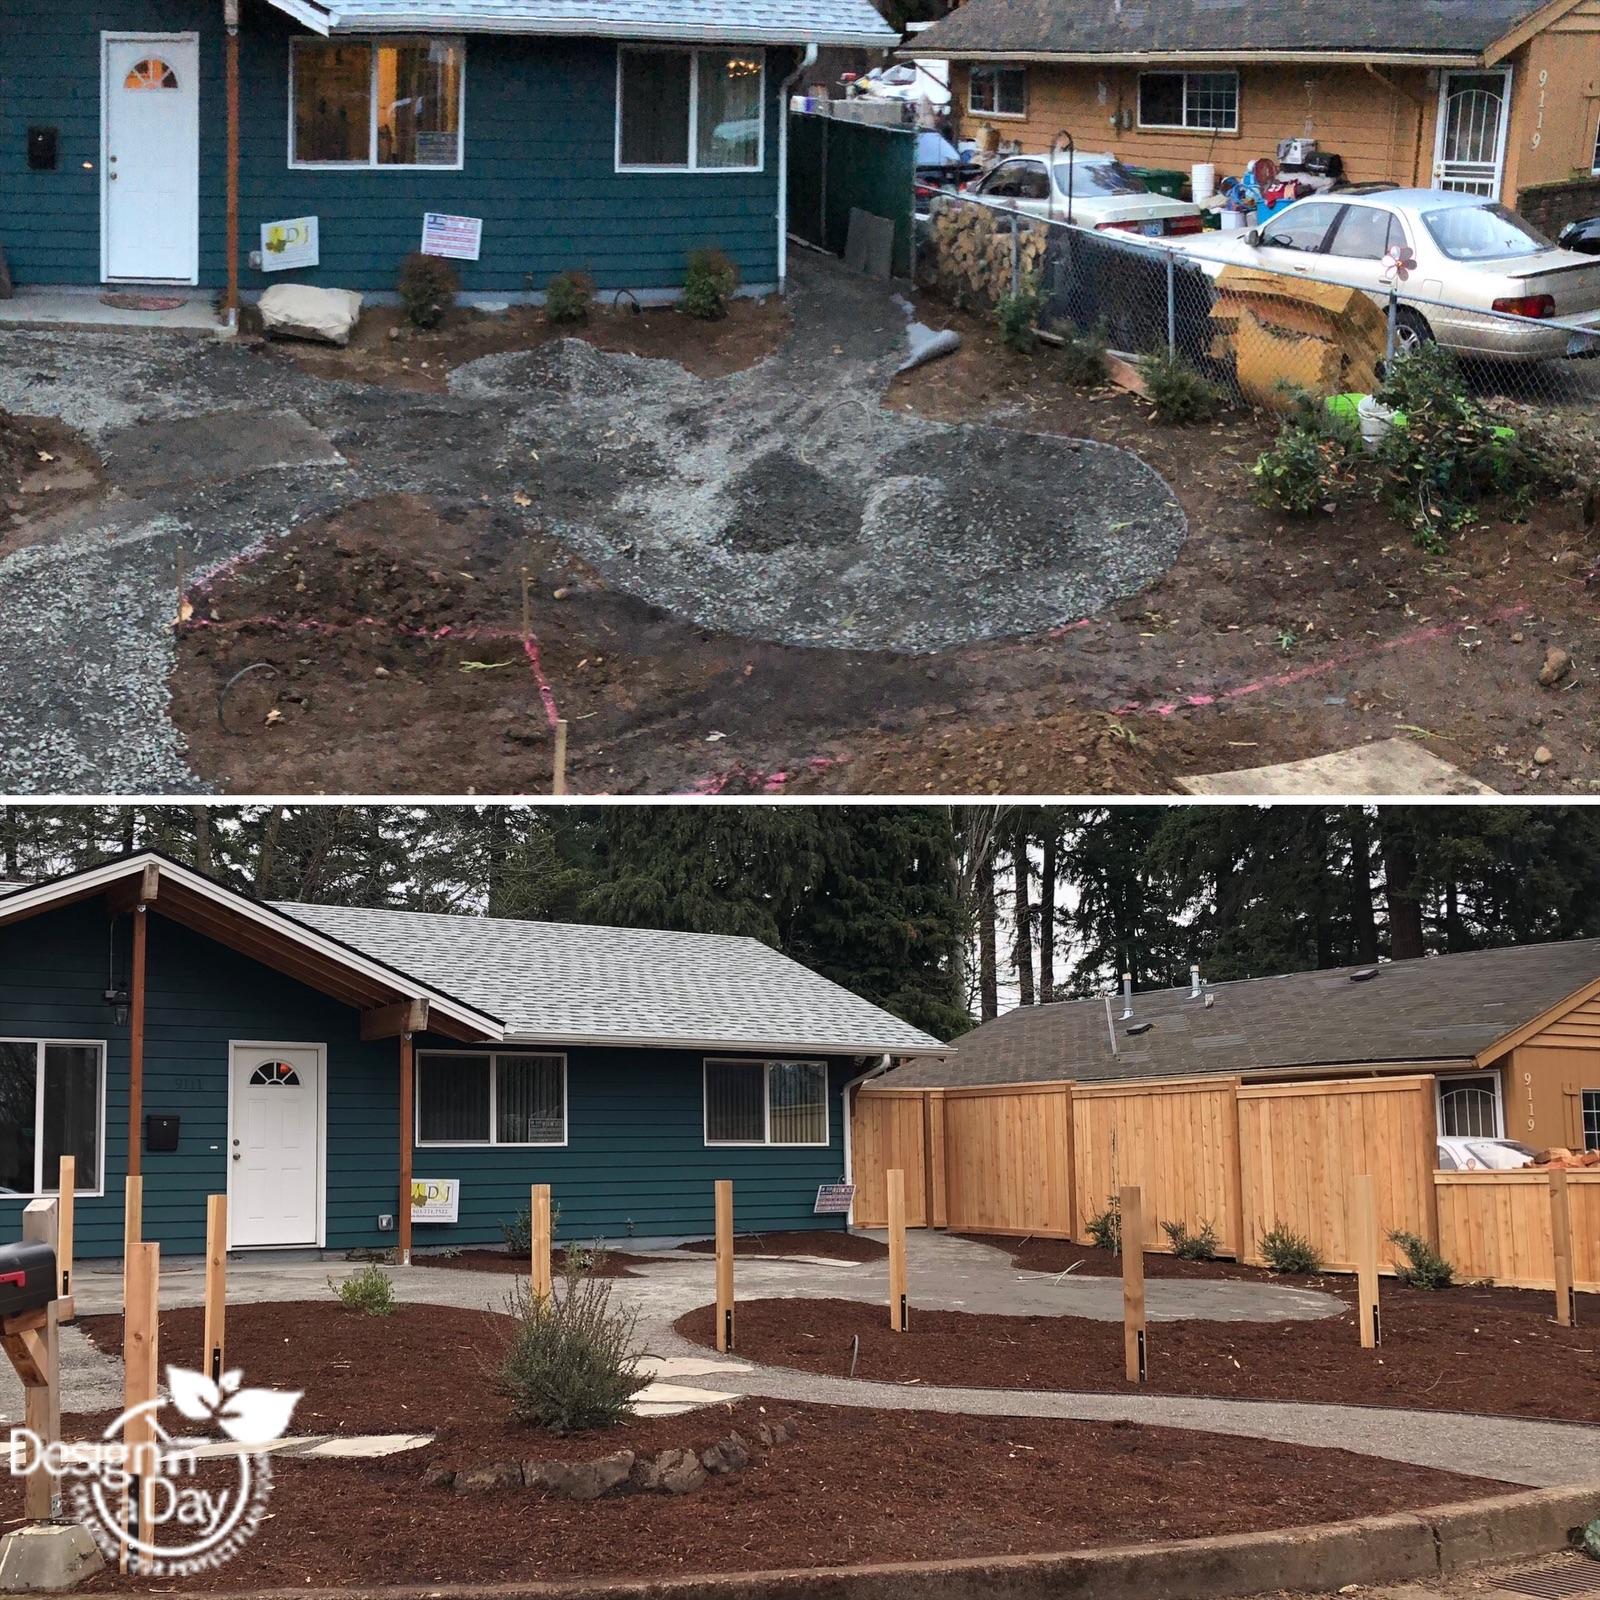 Portland front yard landscape makeover for wild life friendly garden.